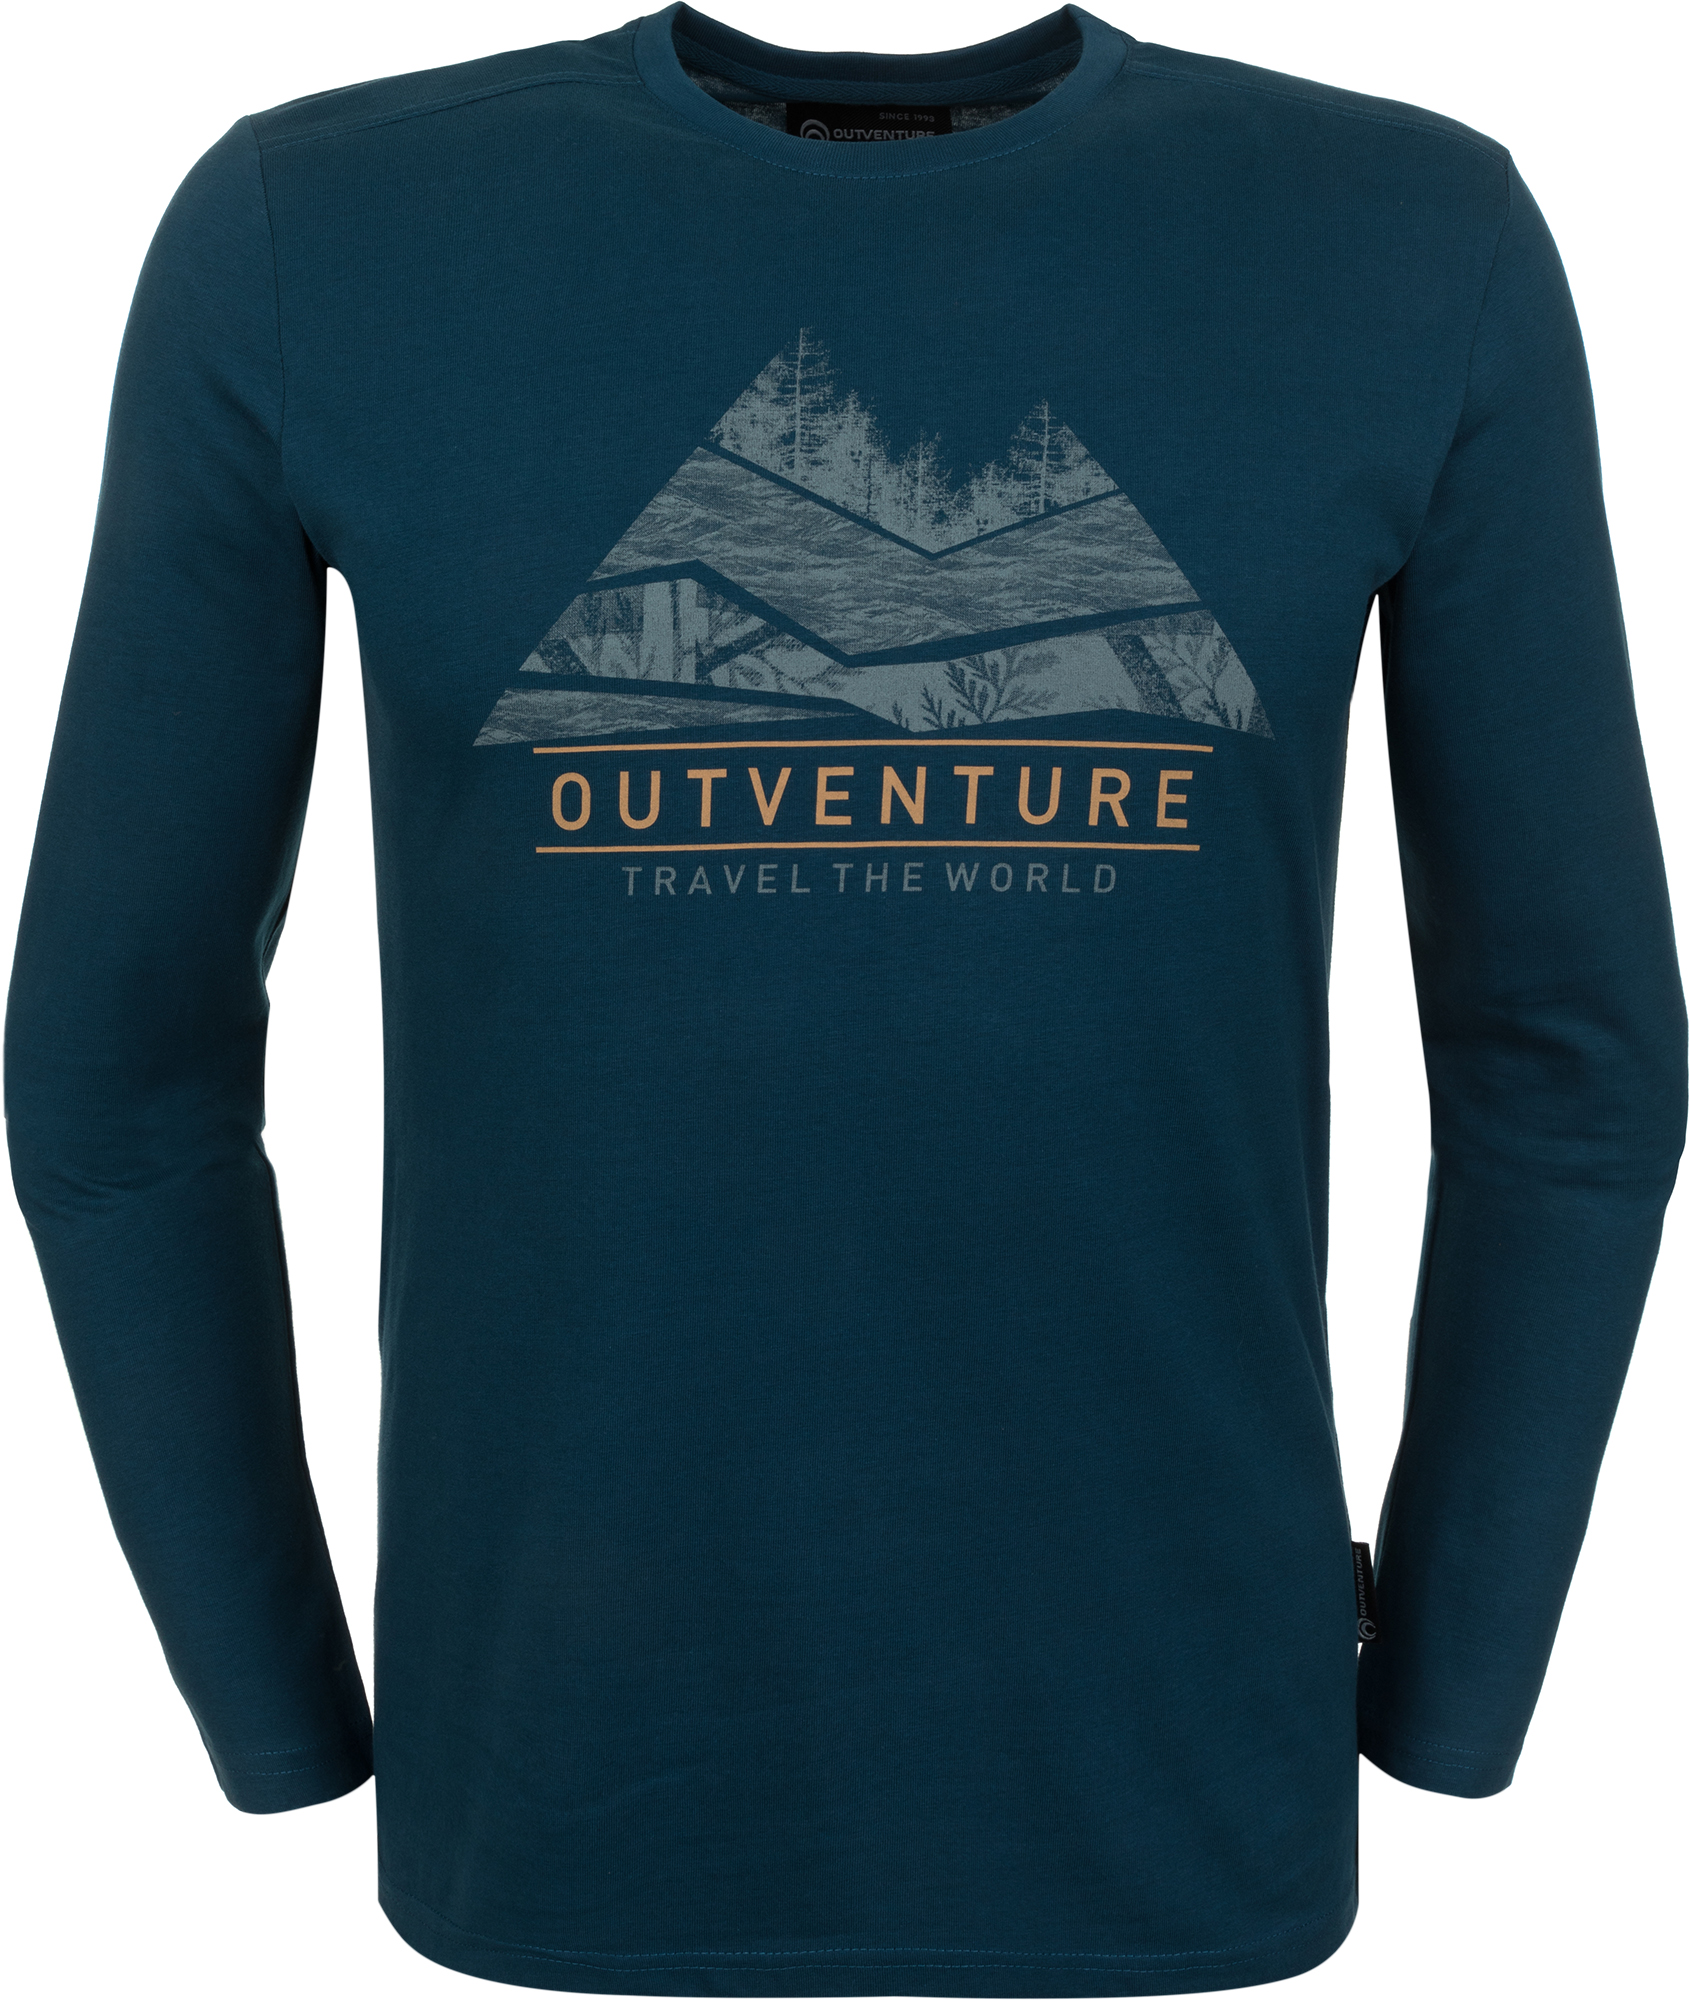 Outventure Футболка с длинным рукавом мужская Outventure, размер 62